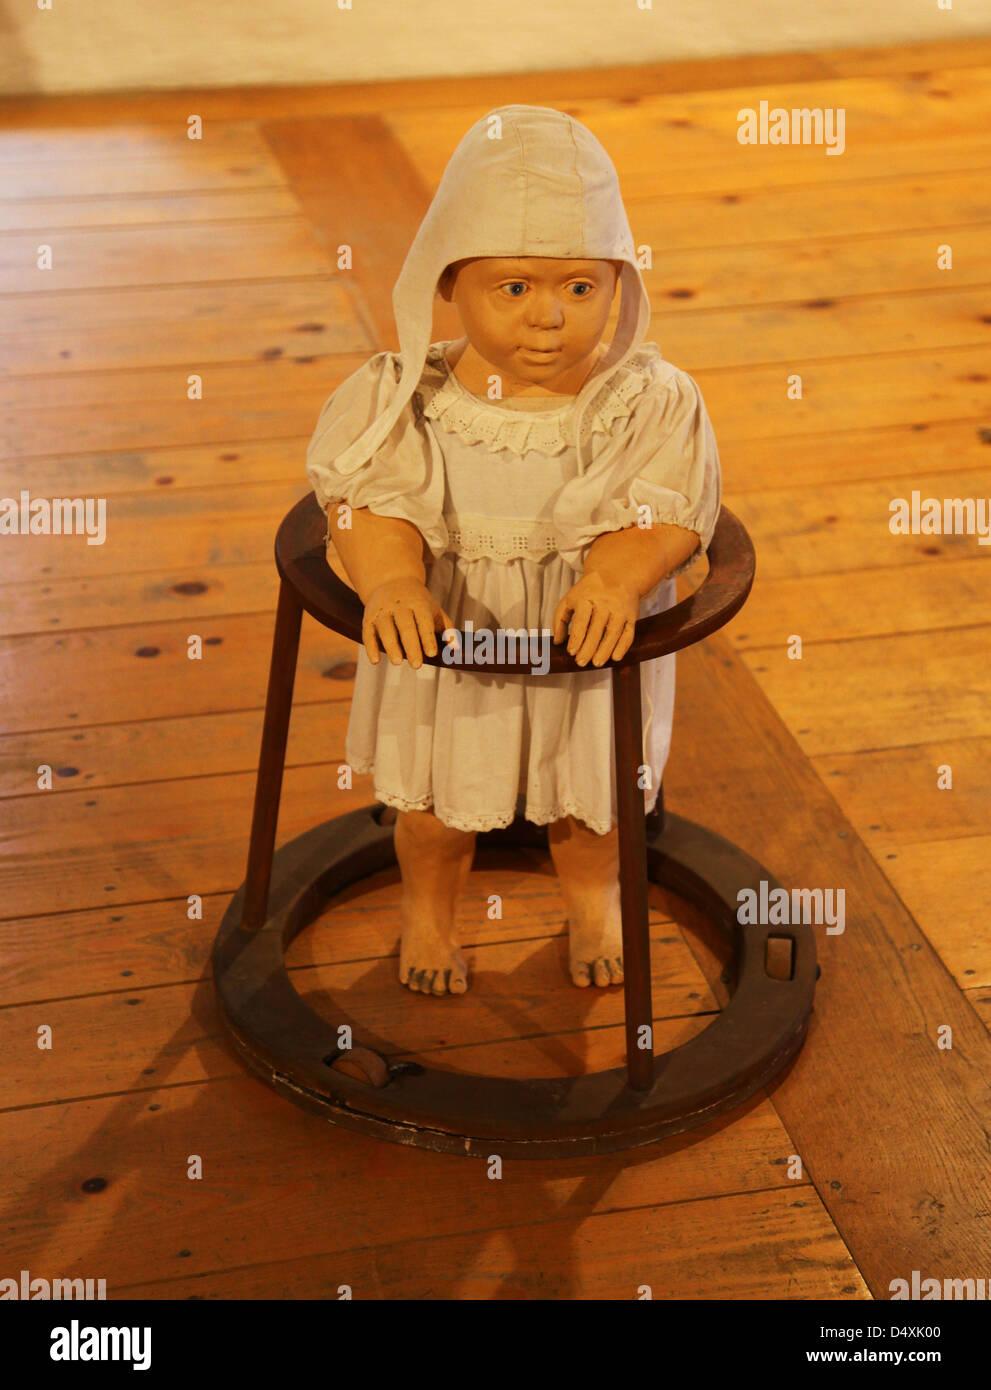 A doll in a medieval baby walker inside Predjama Castle Slovenia - Stock Image